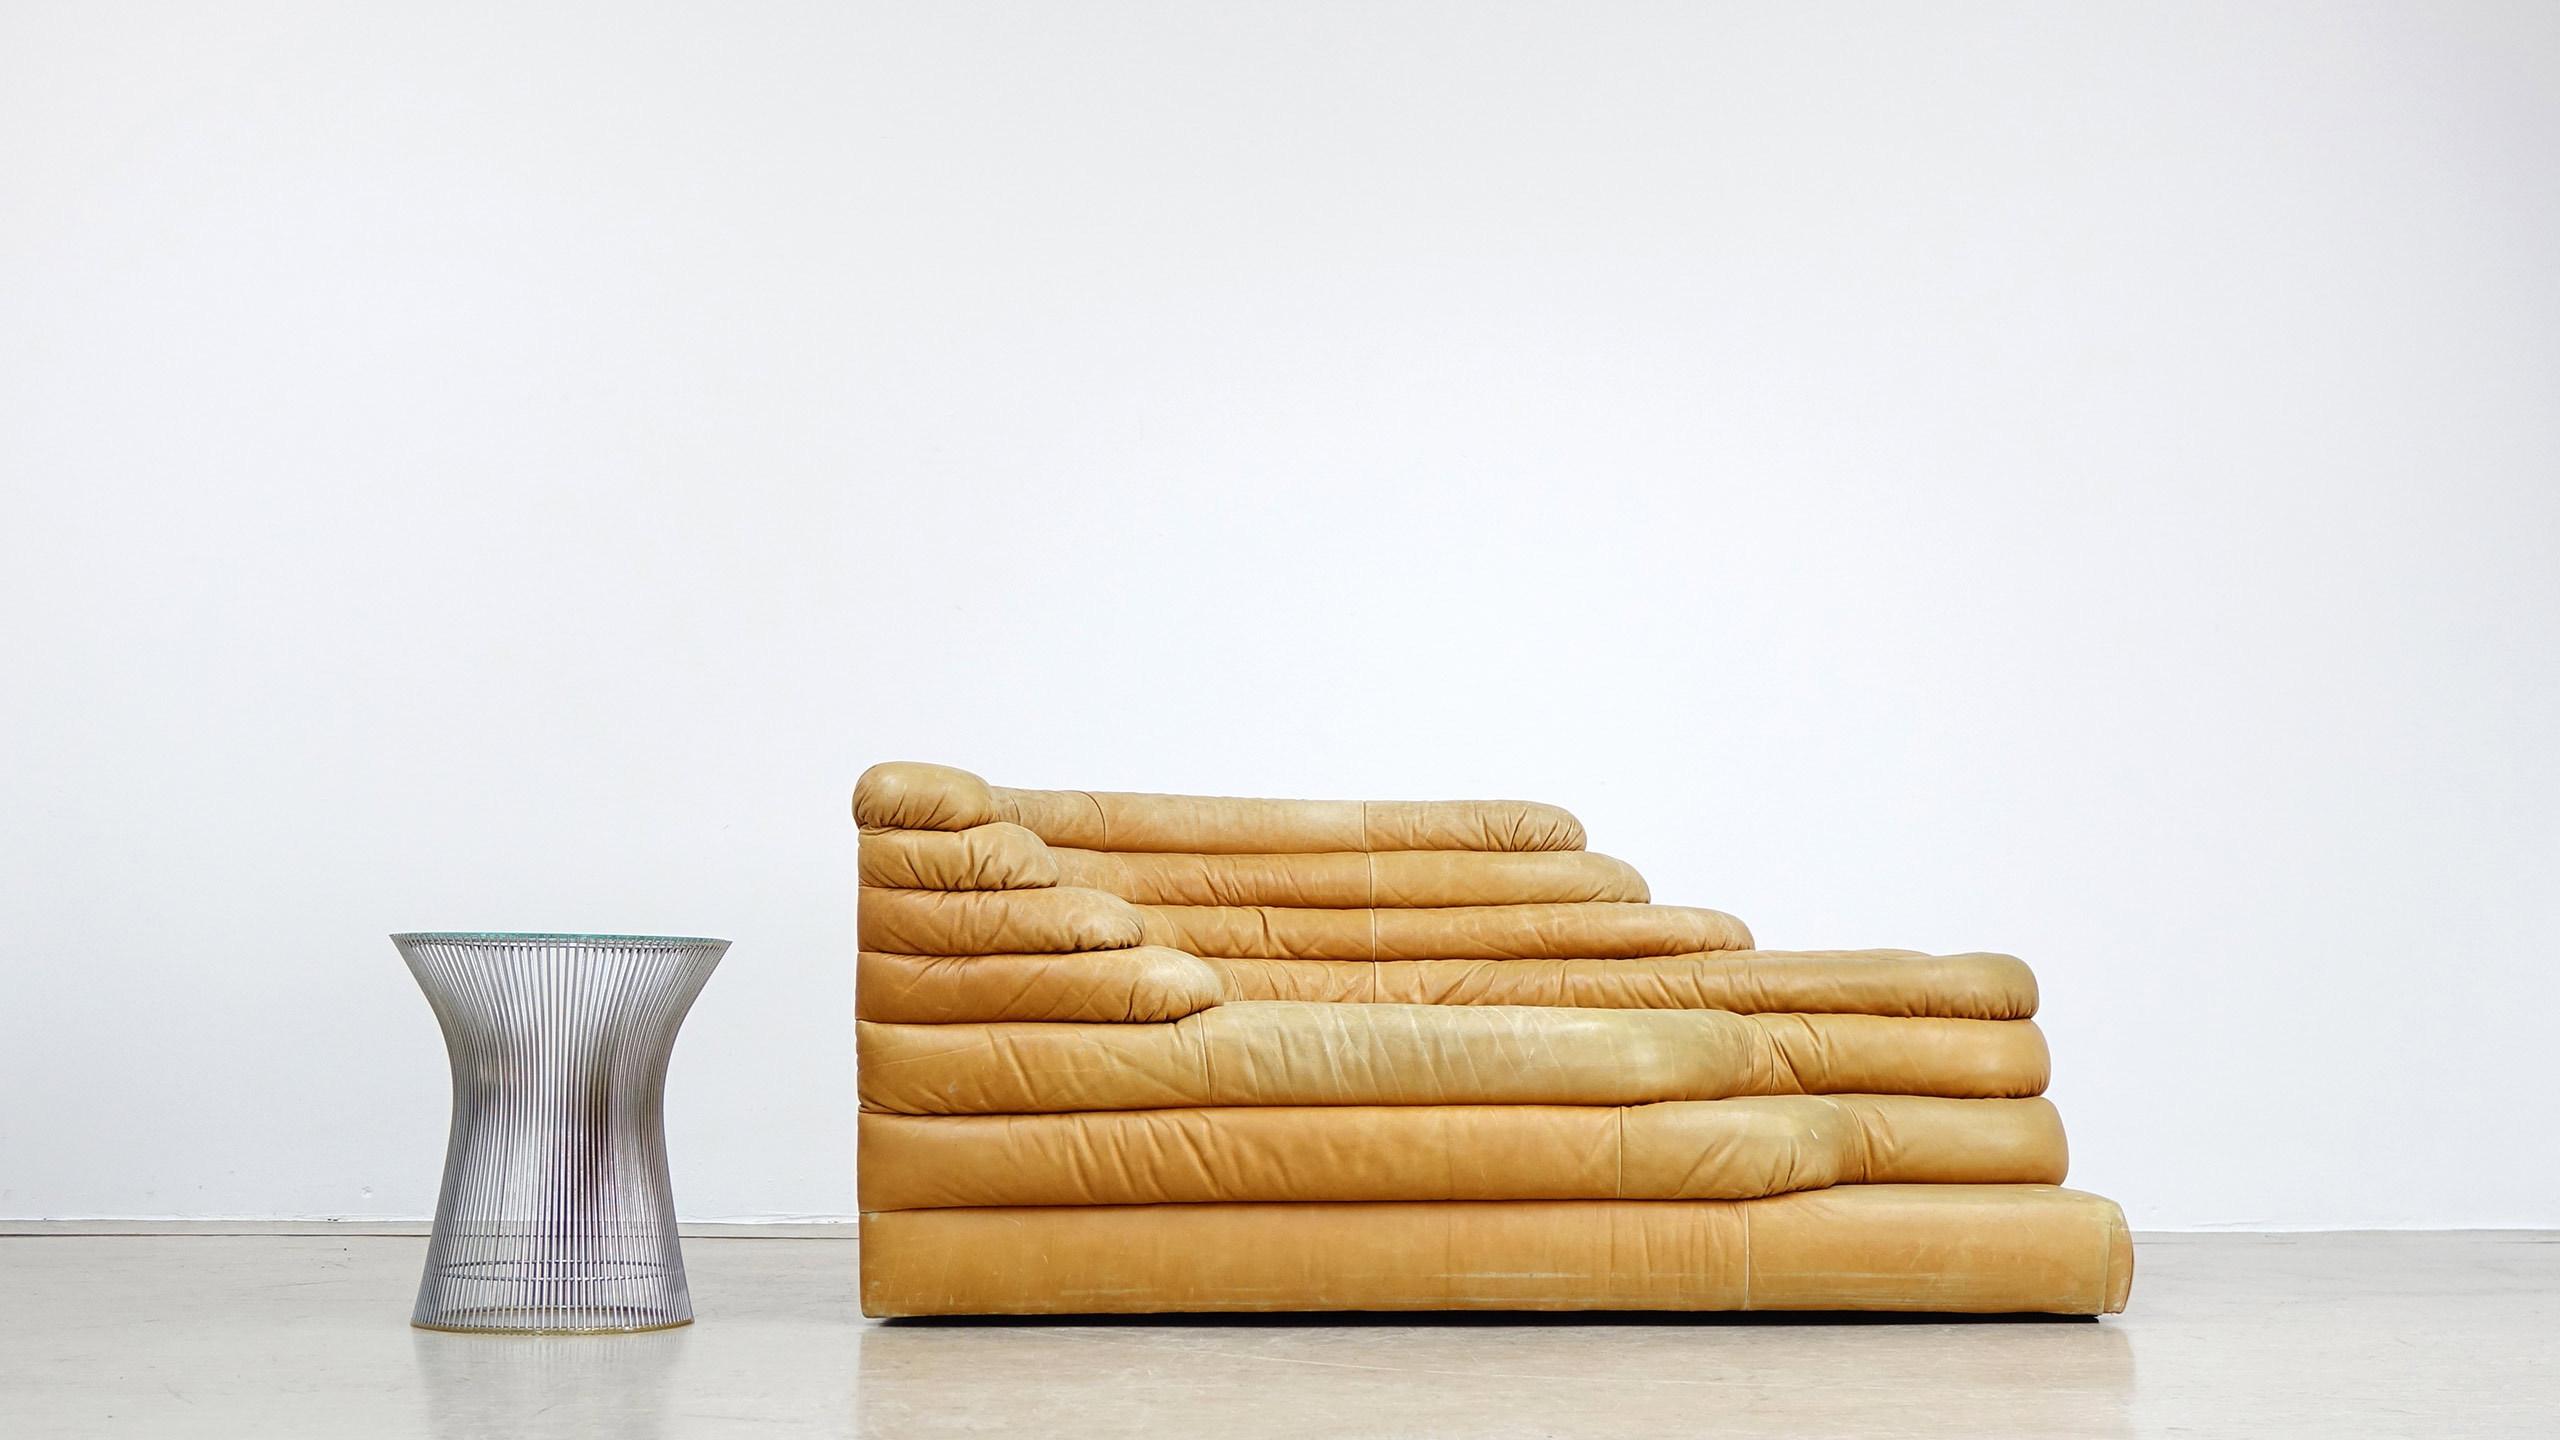 De Sede Terrazza Sofa By Ubald Klug Ds1025 Ueli Berger